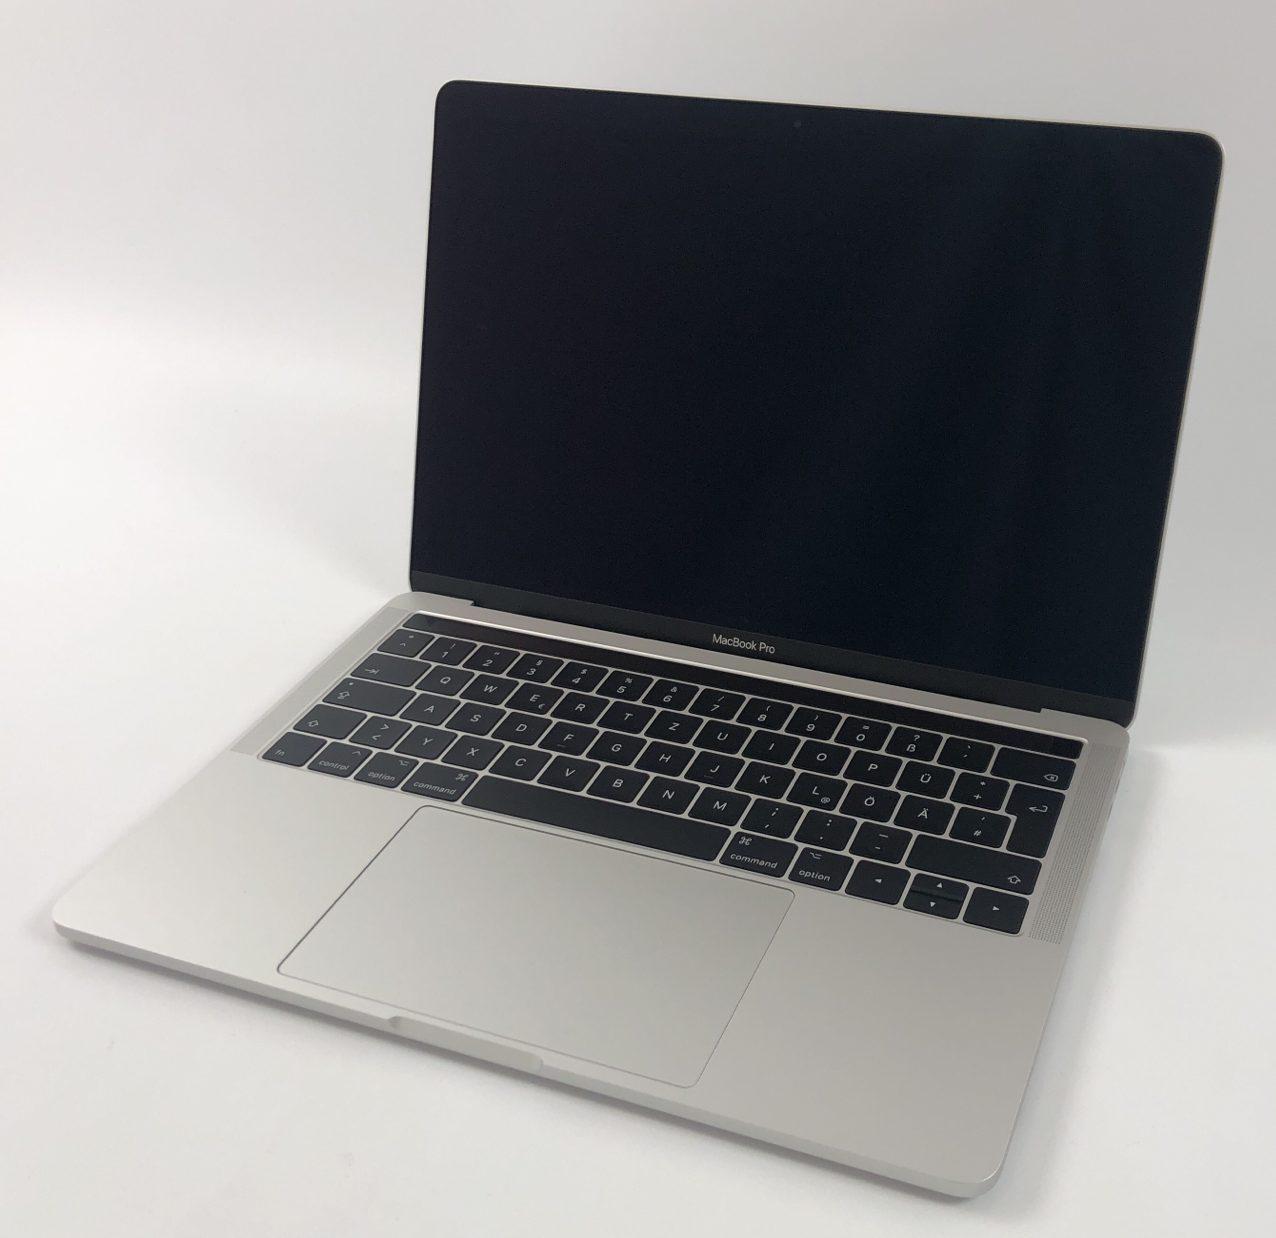 "MacBook Pro 13"" 4TBT Late 2016 (Intel Core i5 2.9 GHz 16 GB RAM 256 GB SSD), Silver, Intel Core i5 2.9 GHz, 16 GB RAM, 256 GB SSD, Bild 1"